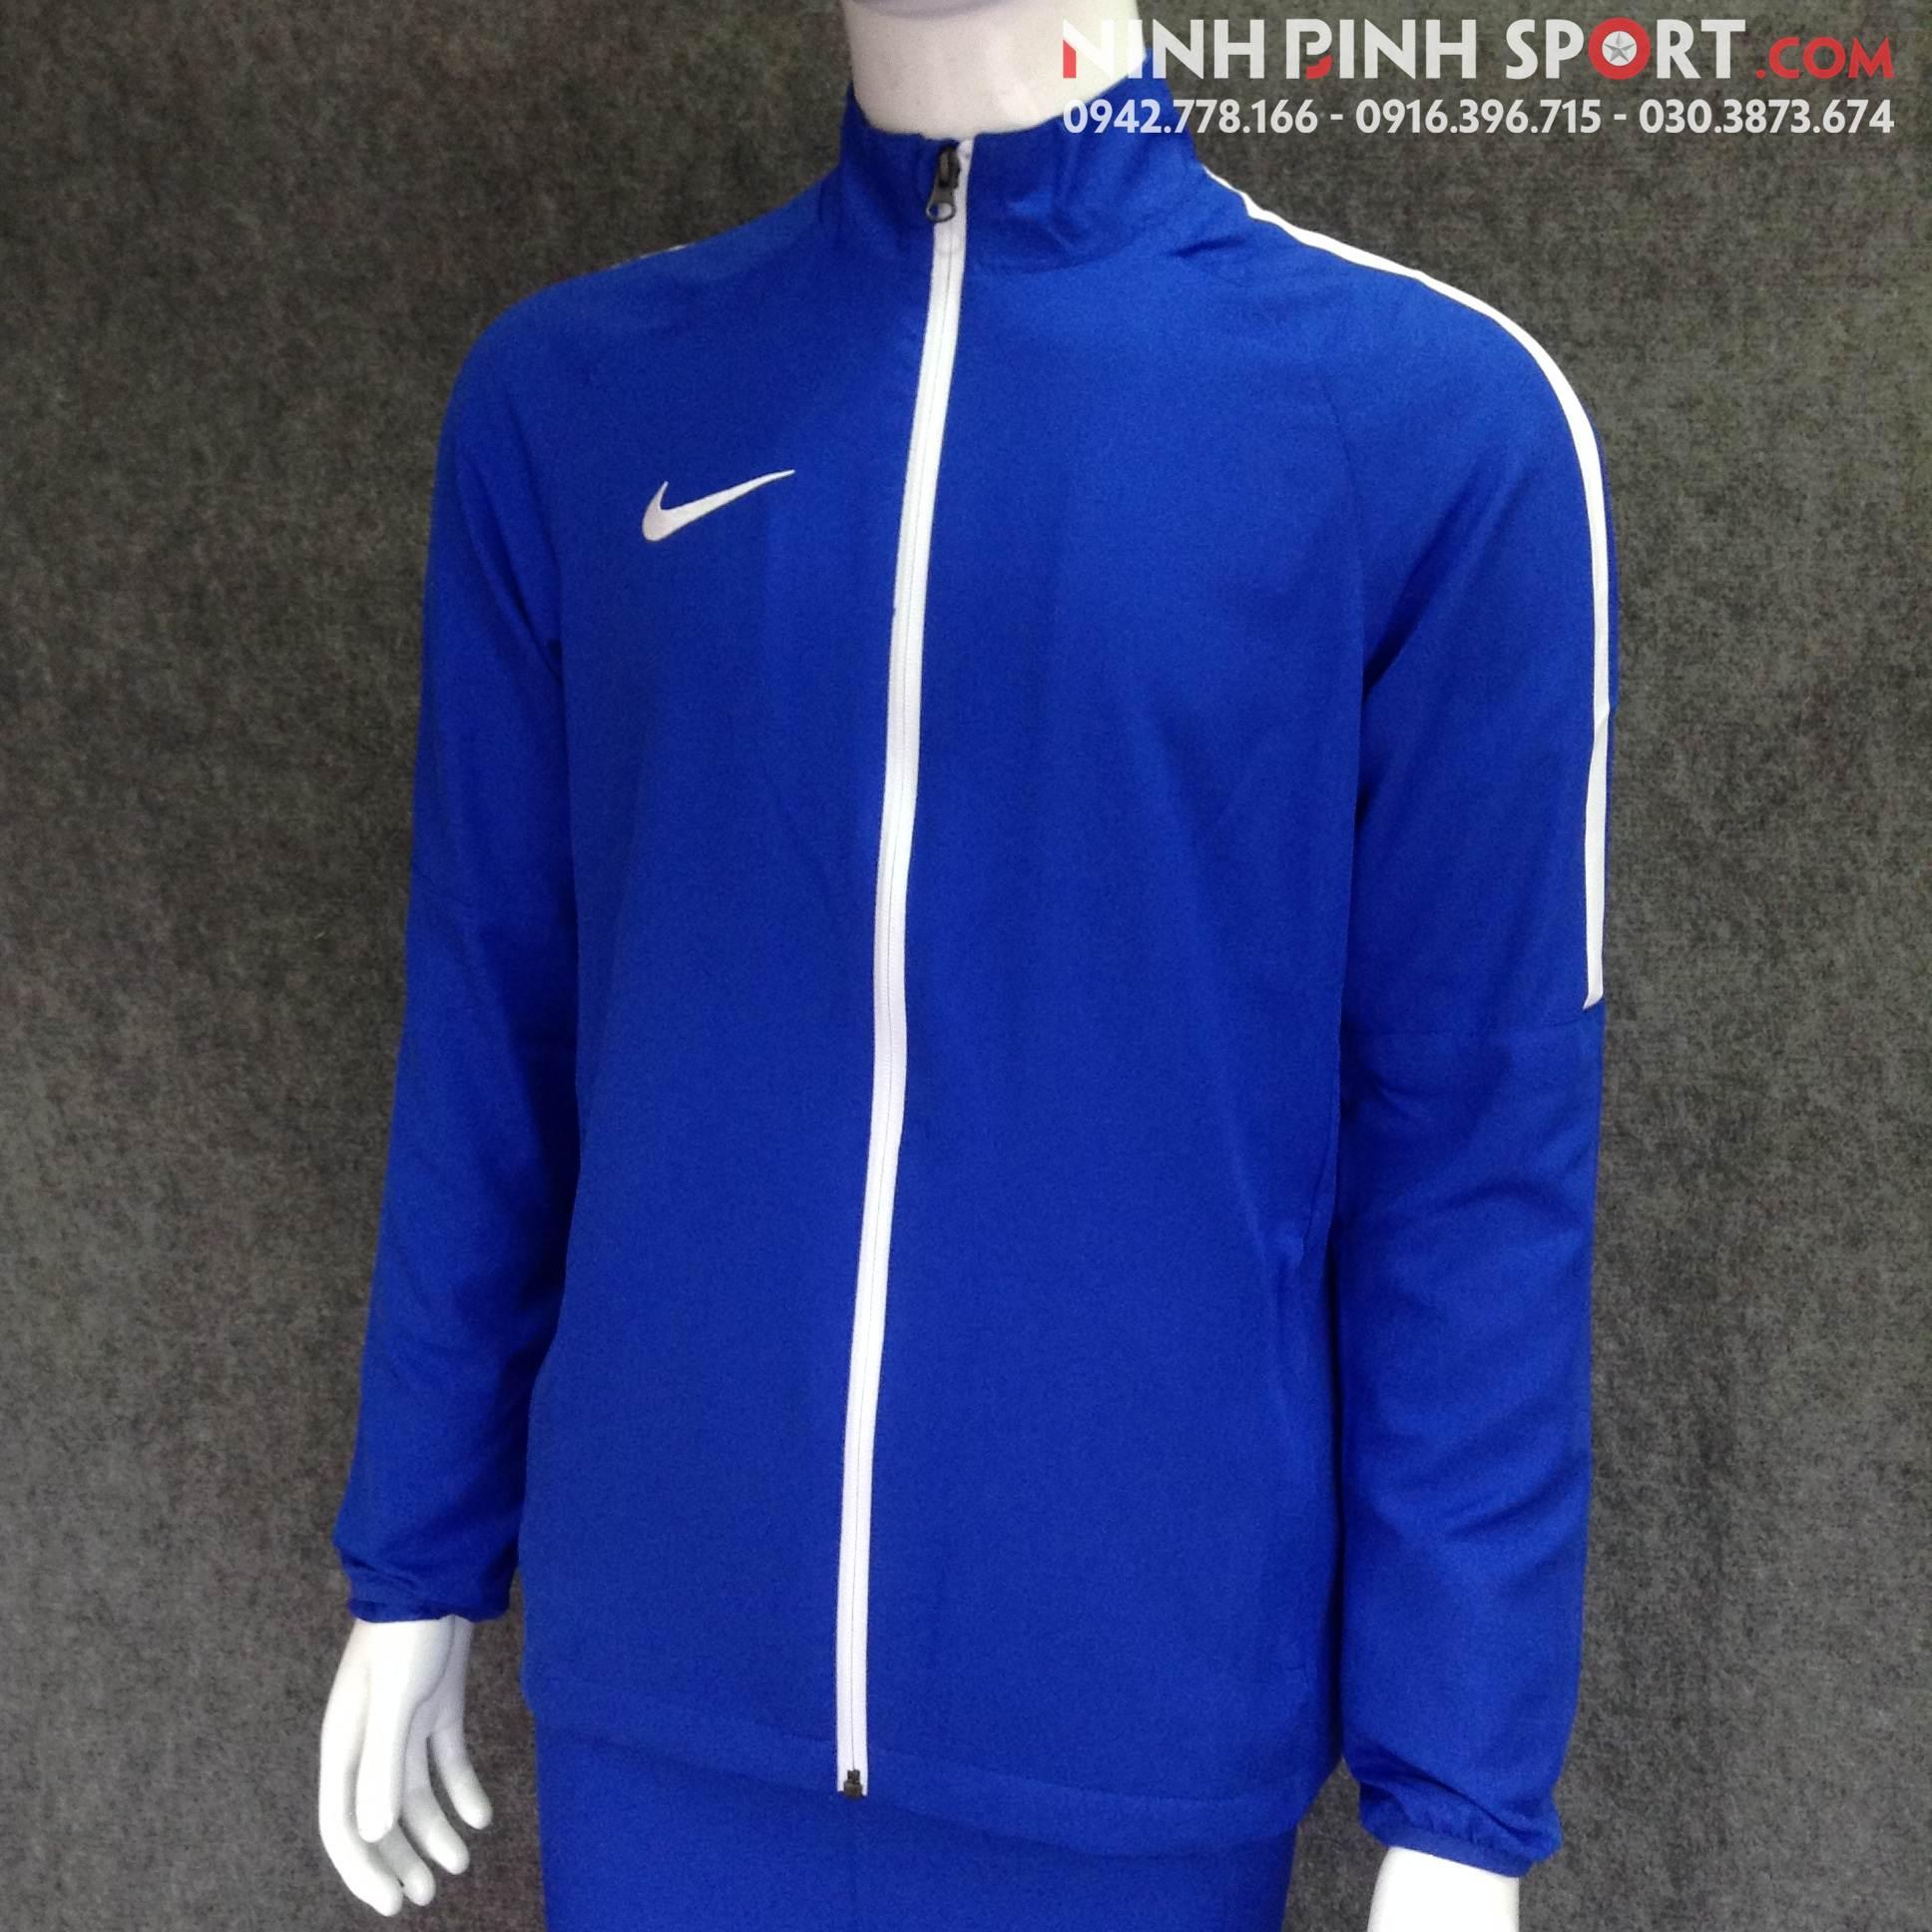 Nike Dry Academy Men's Football Set 844330-480